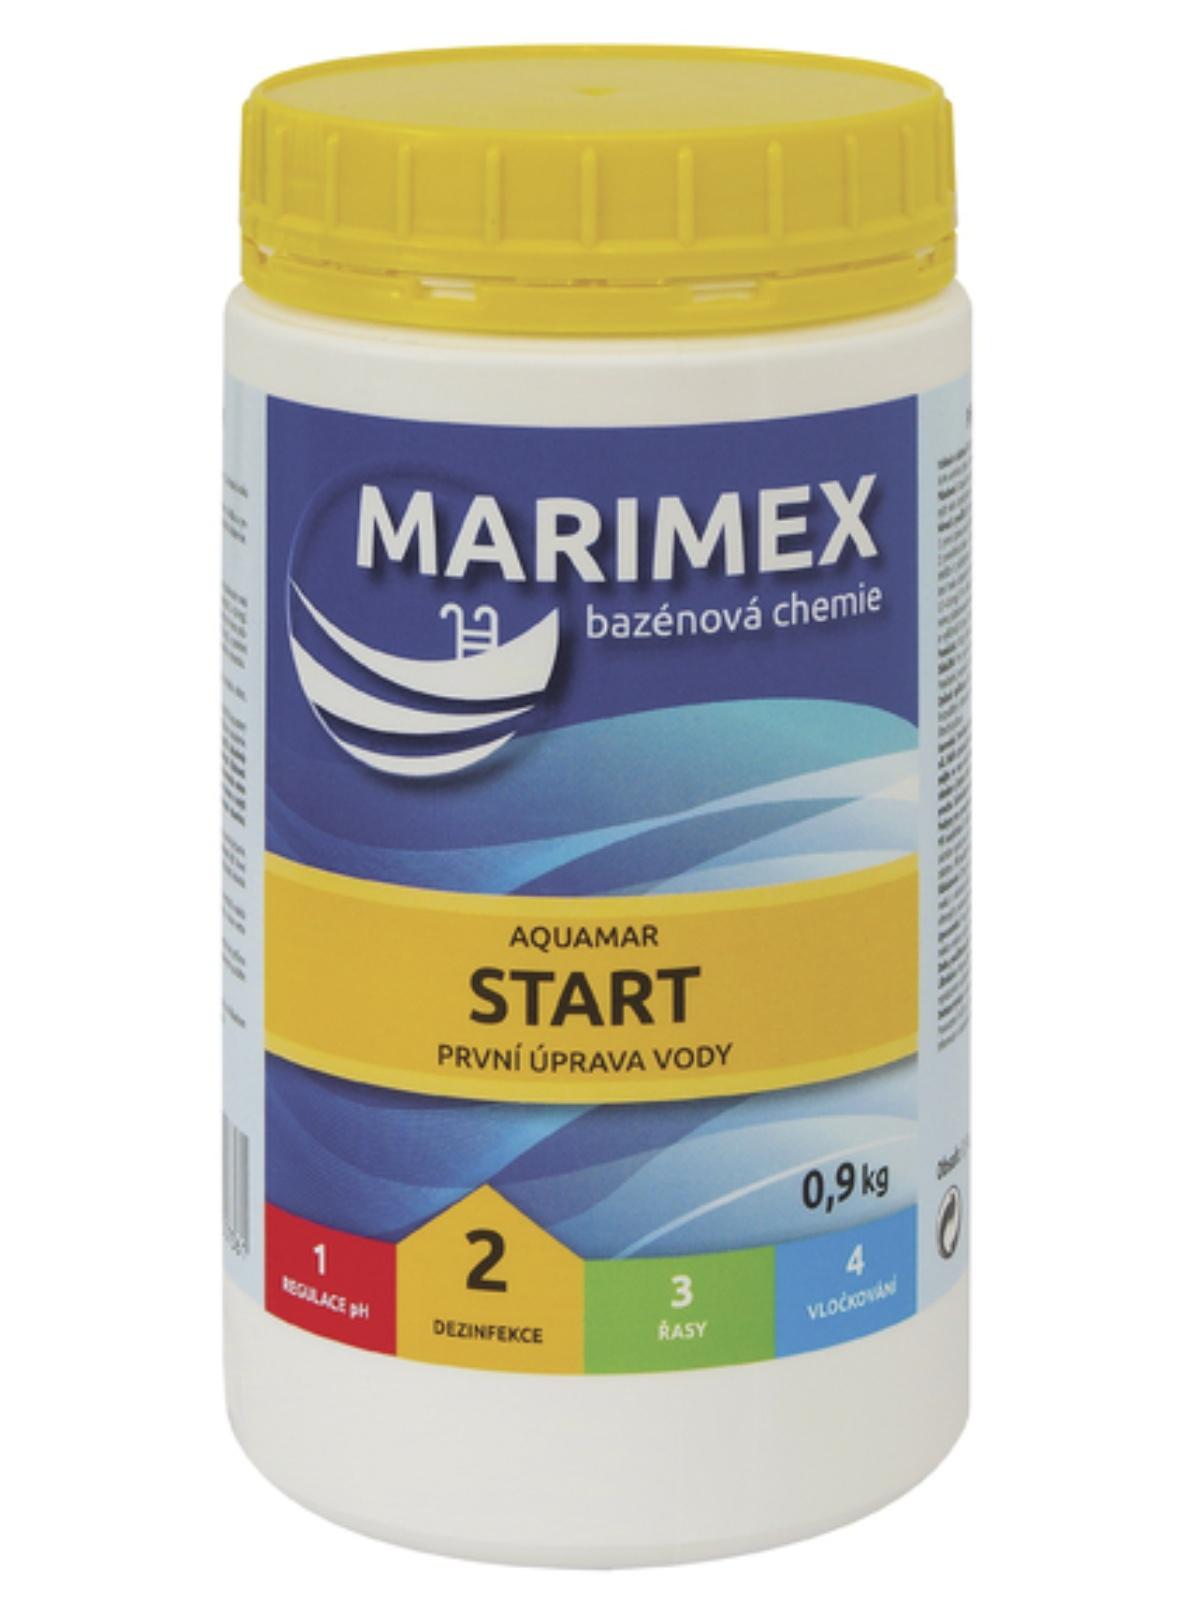 MARIMEX AQuaMar Start 900g